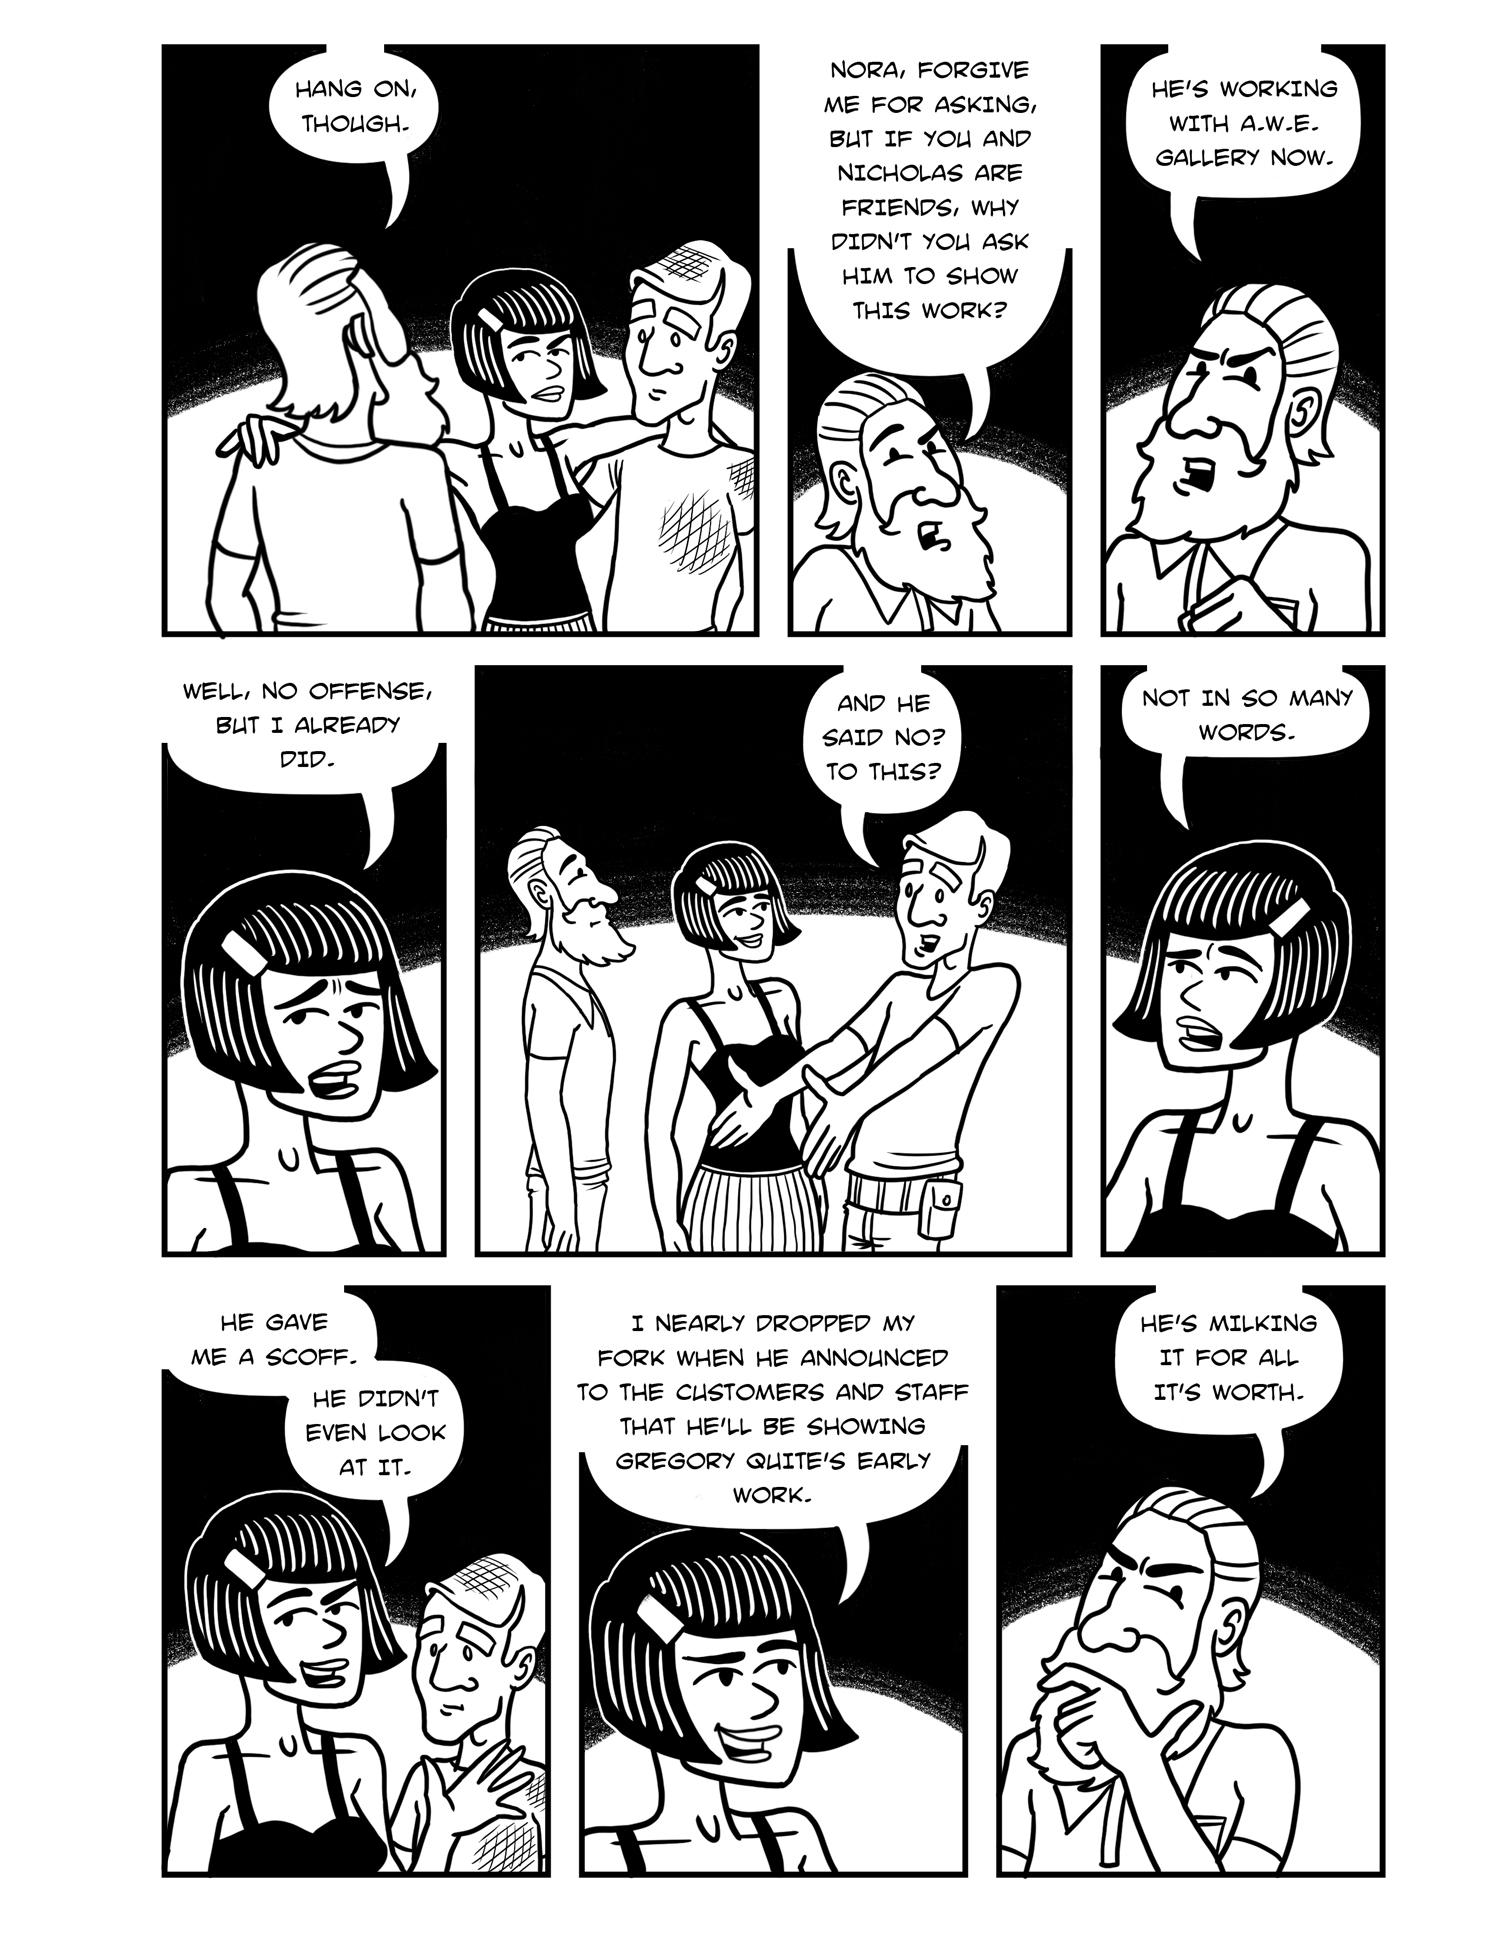 PAGE-344.jpg